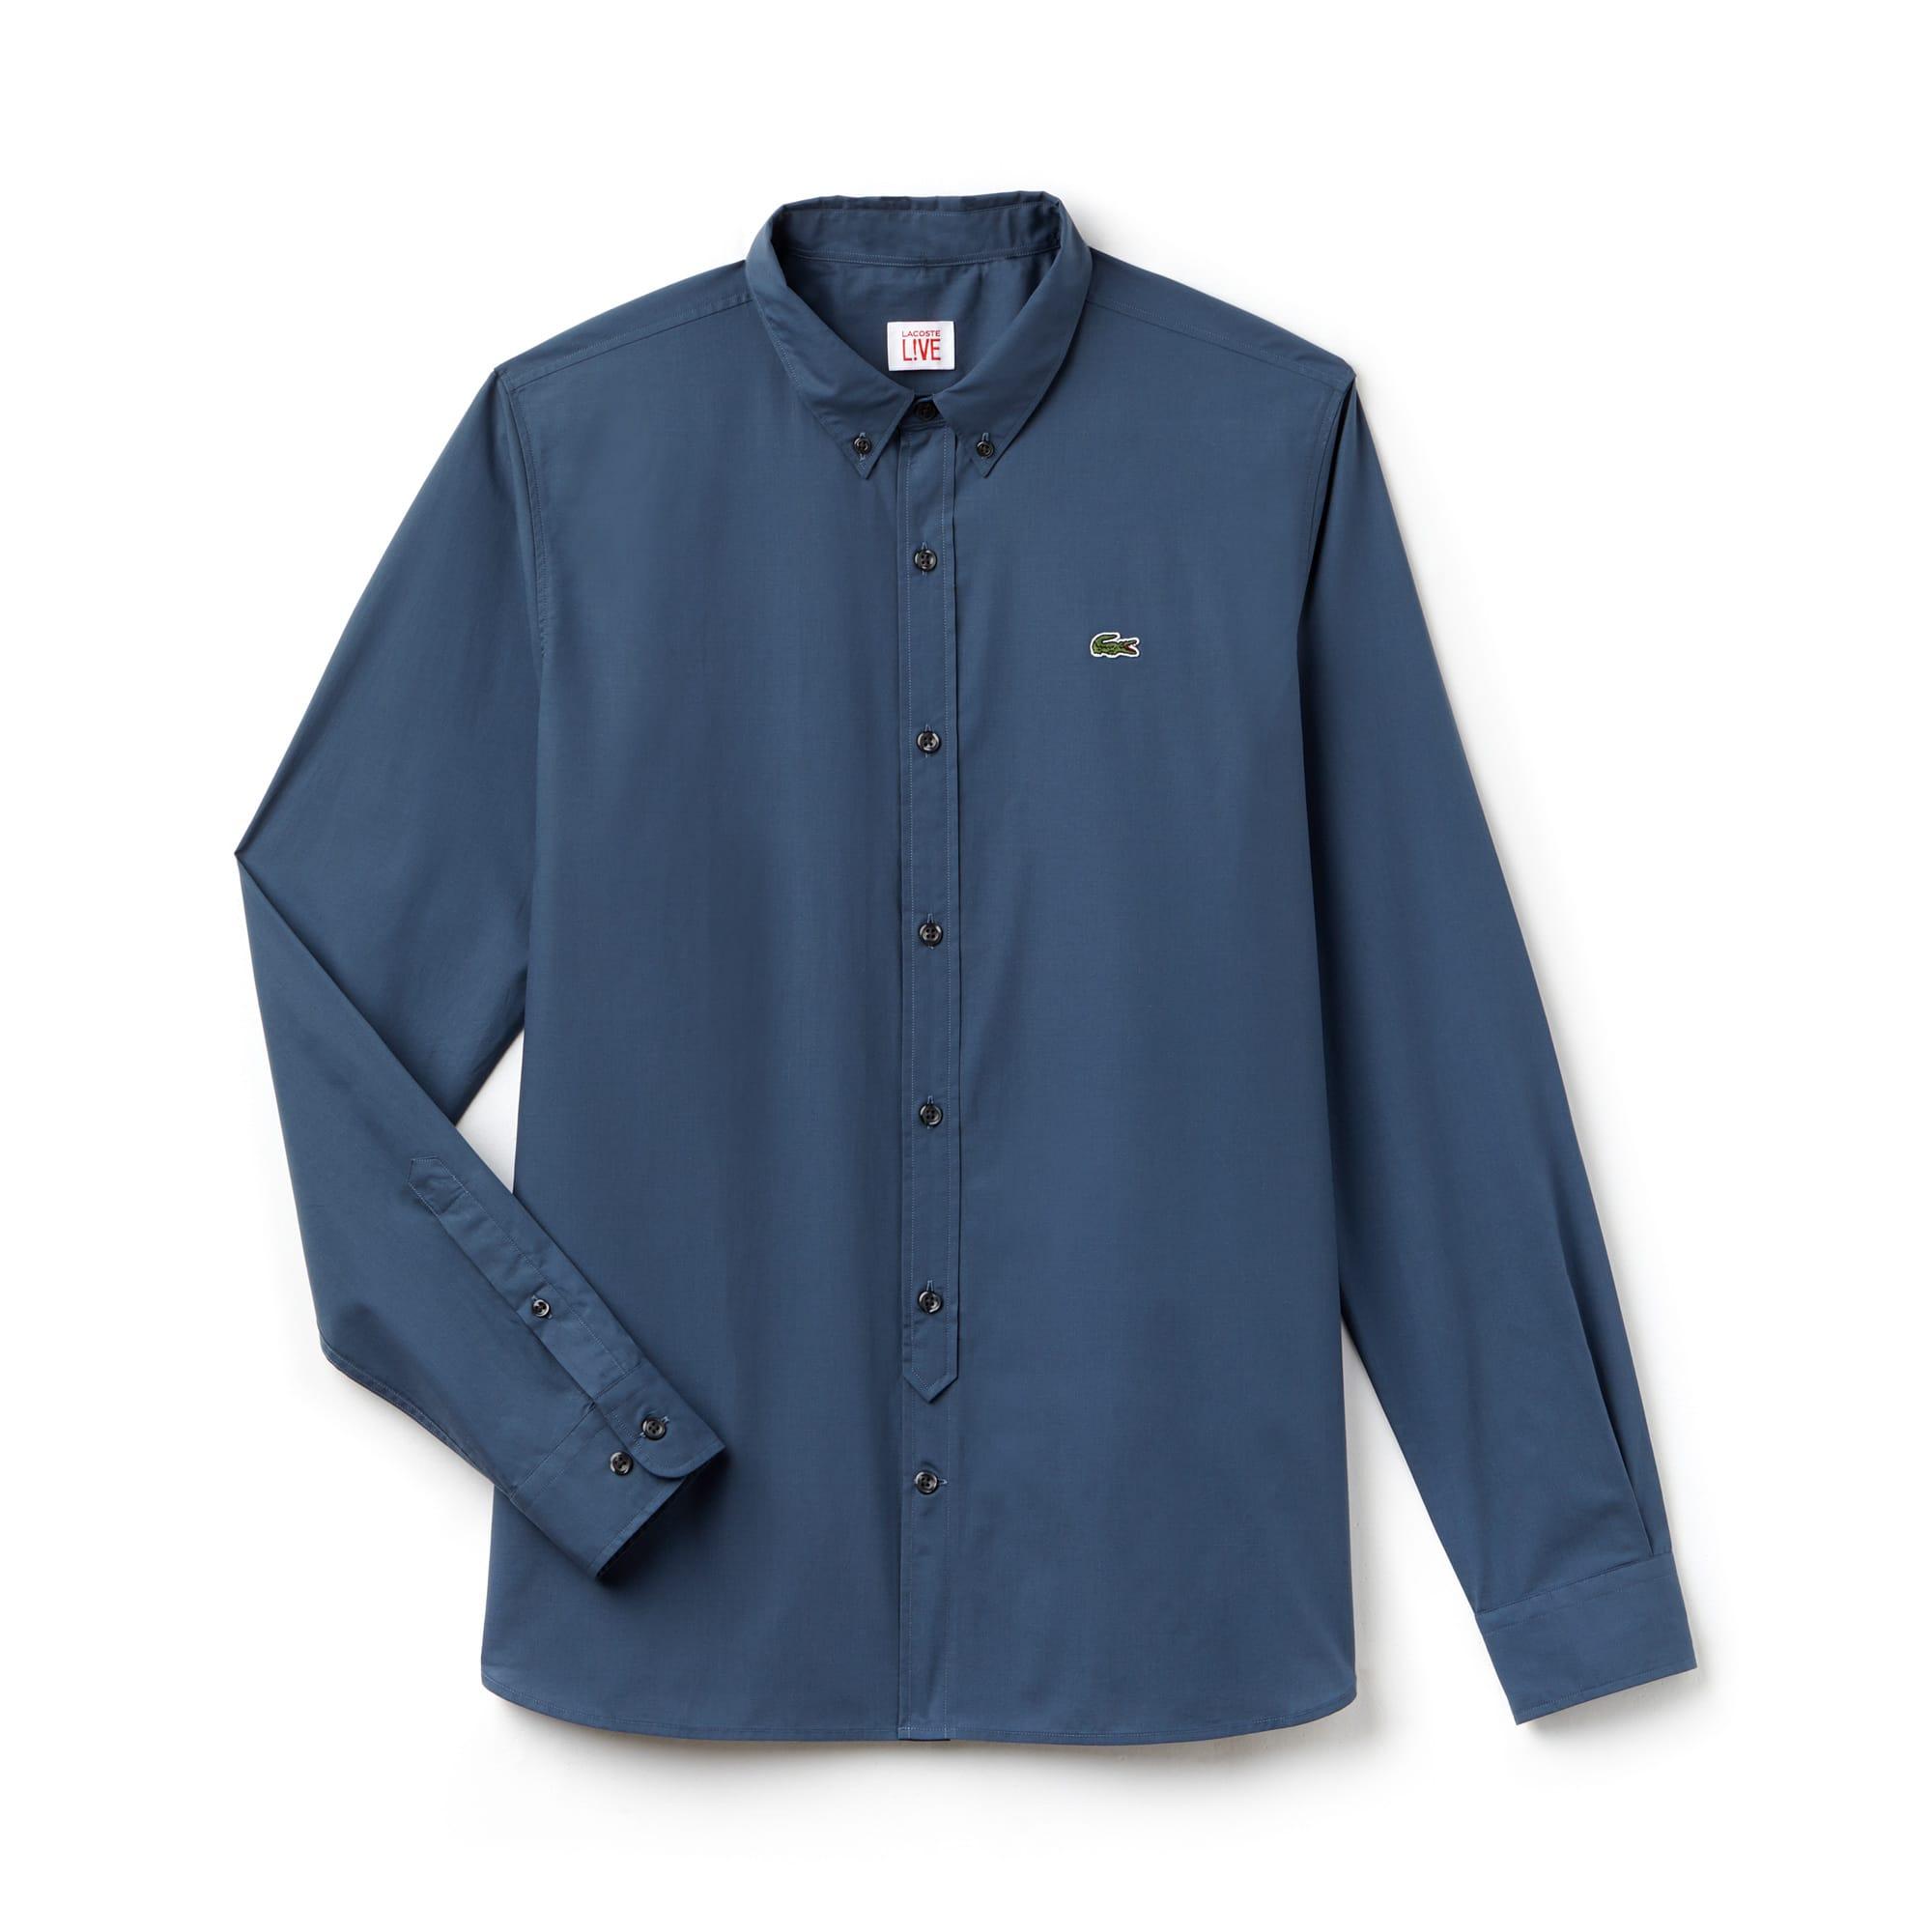 Men's Lacoste LIVE Skinny Fit Cotton Poplin Shirt